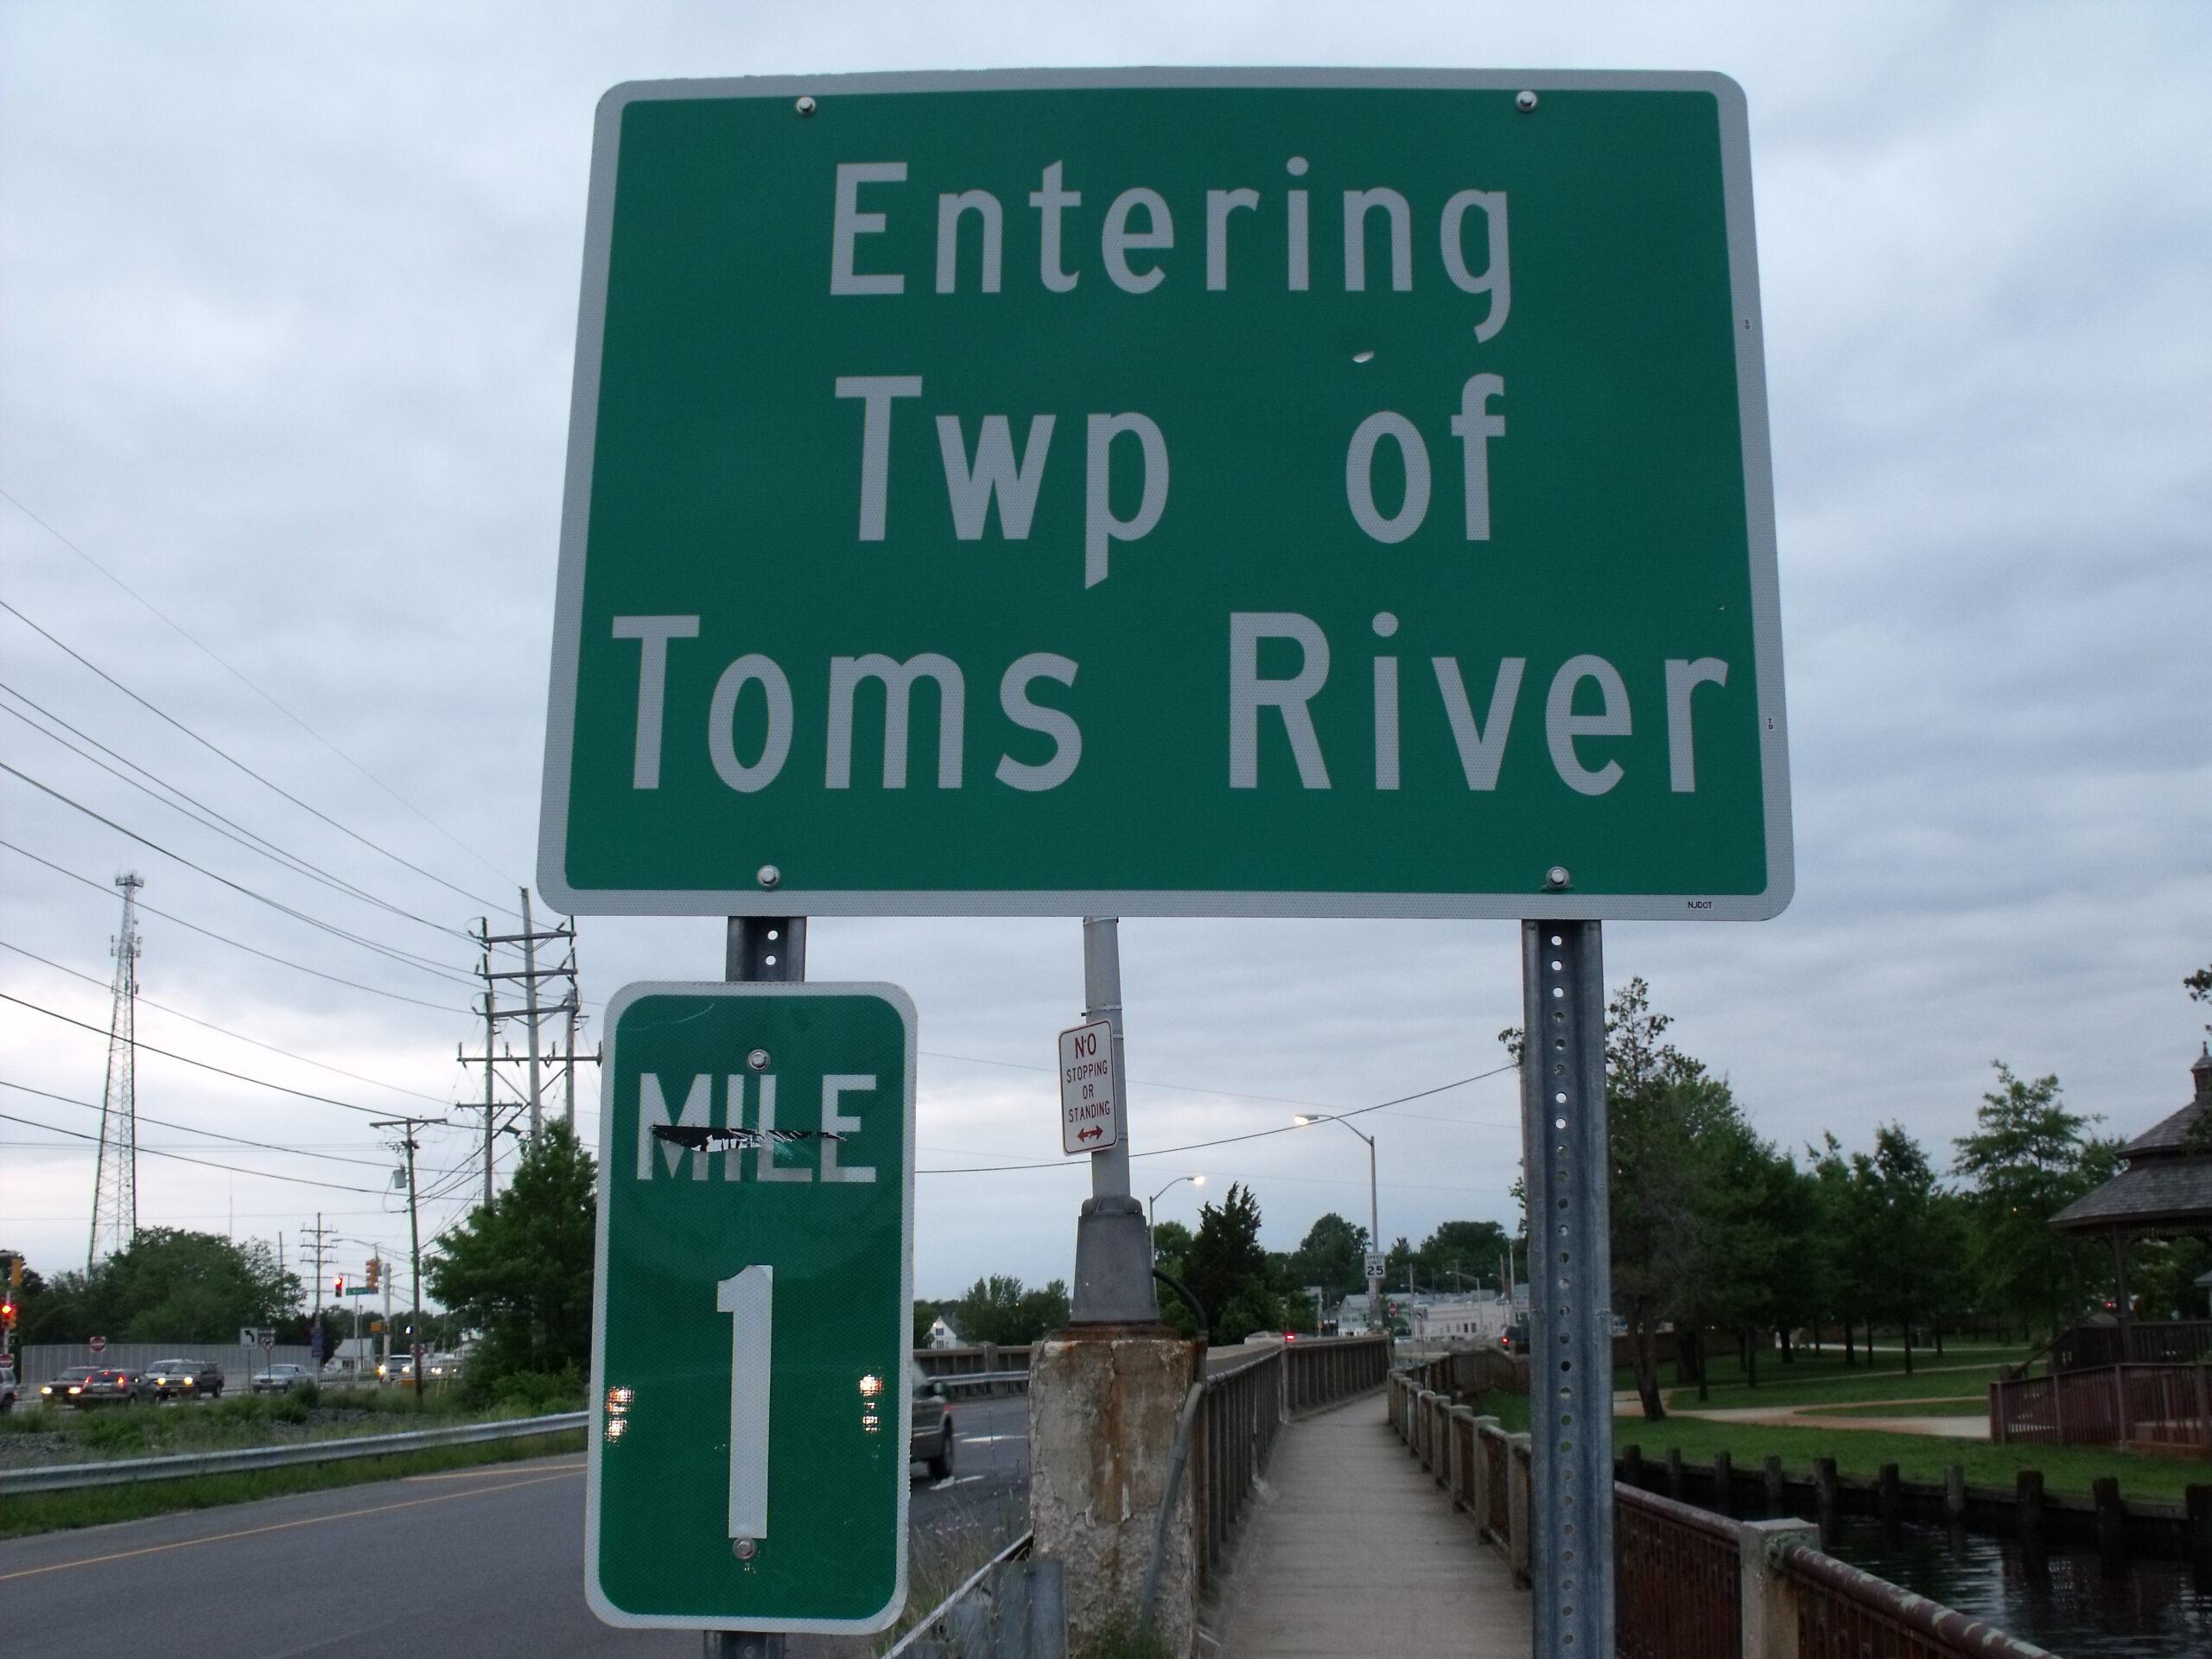 TOMS RIVER: REPUBLICAN COUNCIL CANDIDATES SPLIT VICTORY